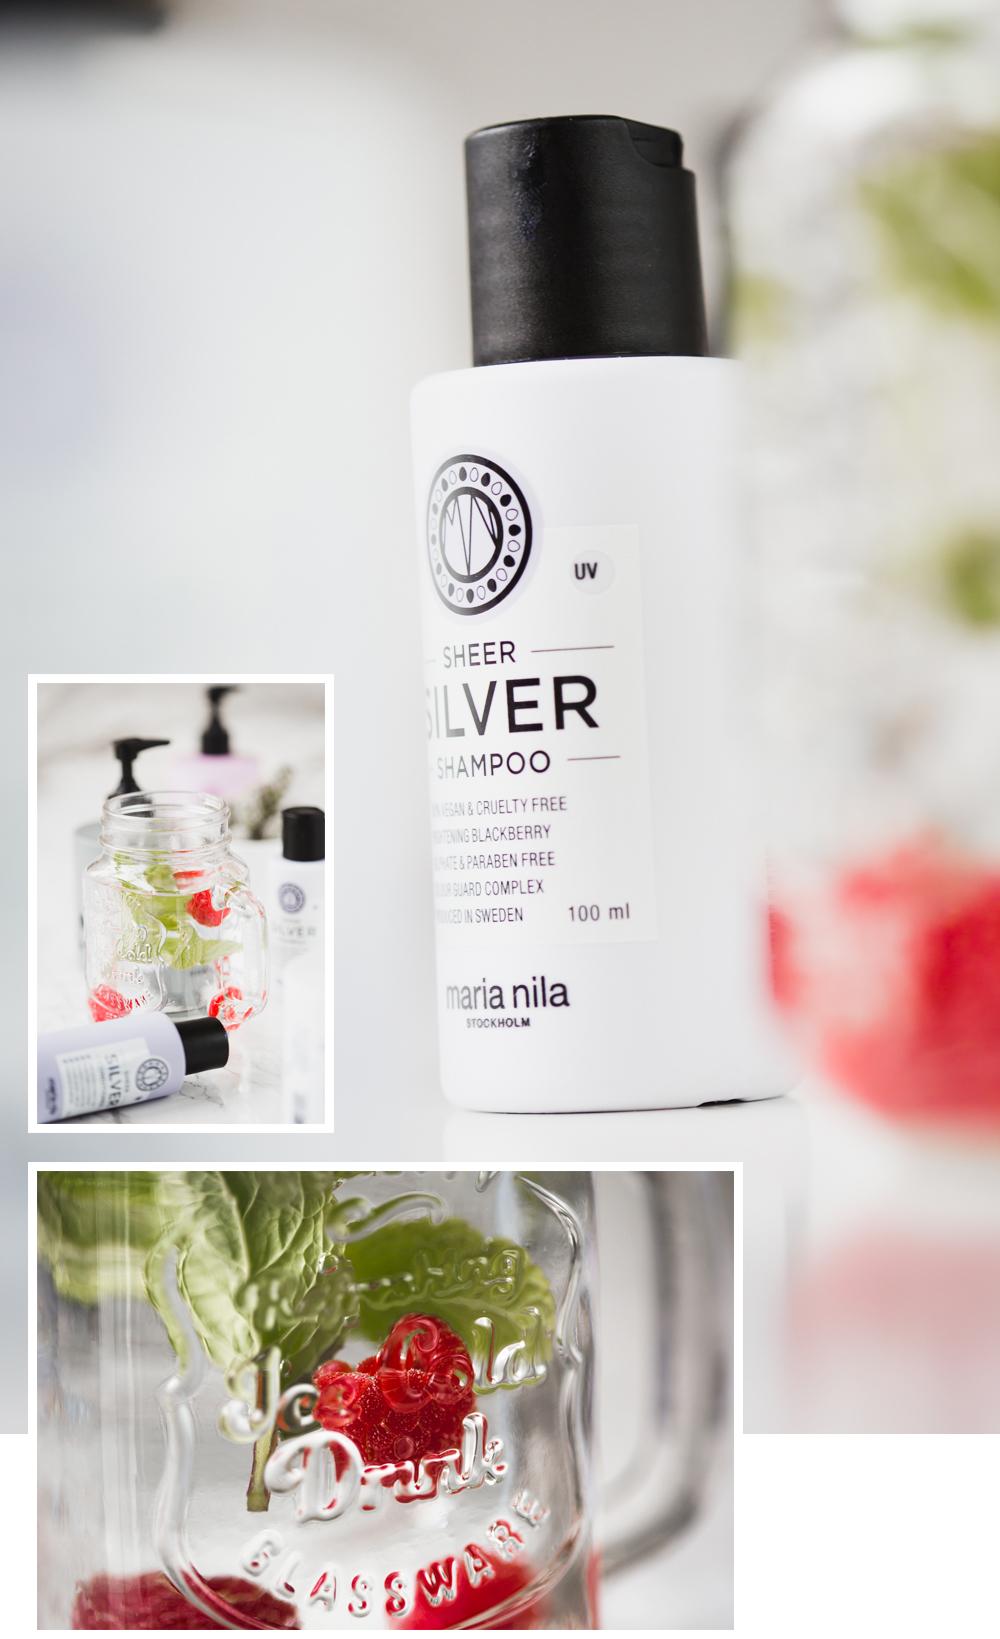 Maria Nila Sheer Silver Shampoo für kühles Blond